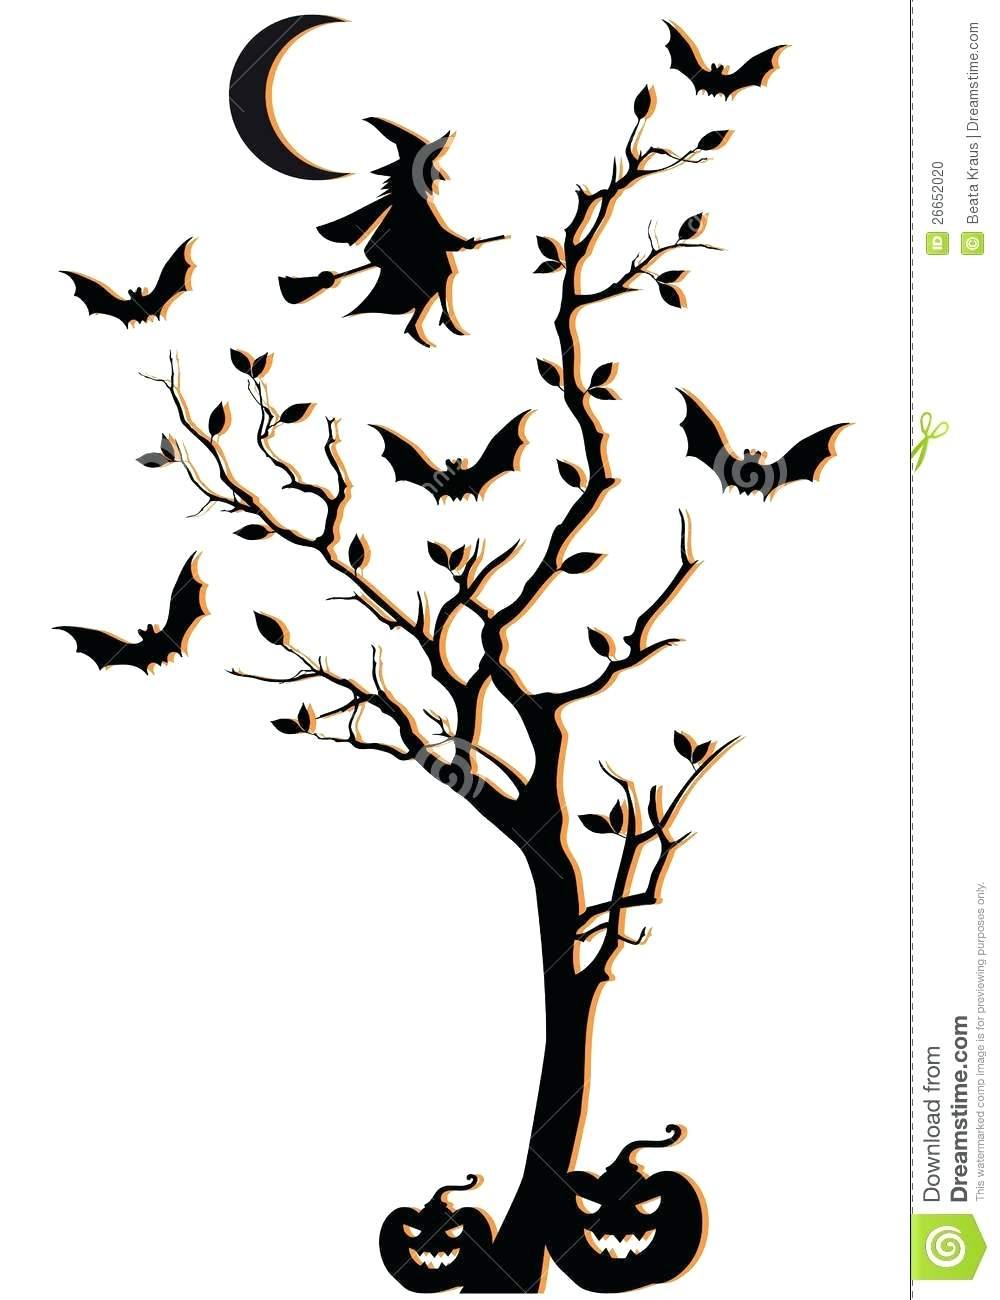 1000x1300 Halloween Tree Template Spooky Halloween Tree Template Scary